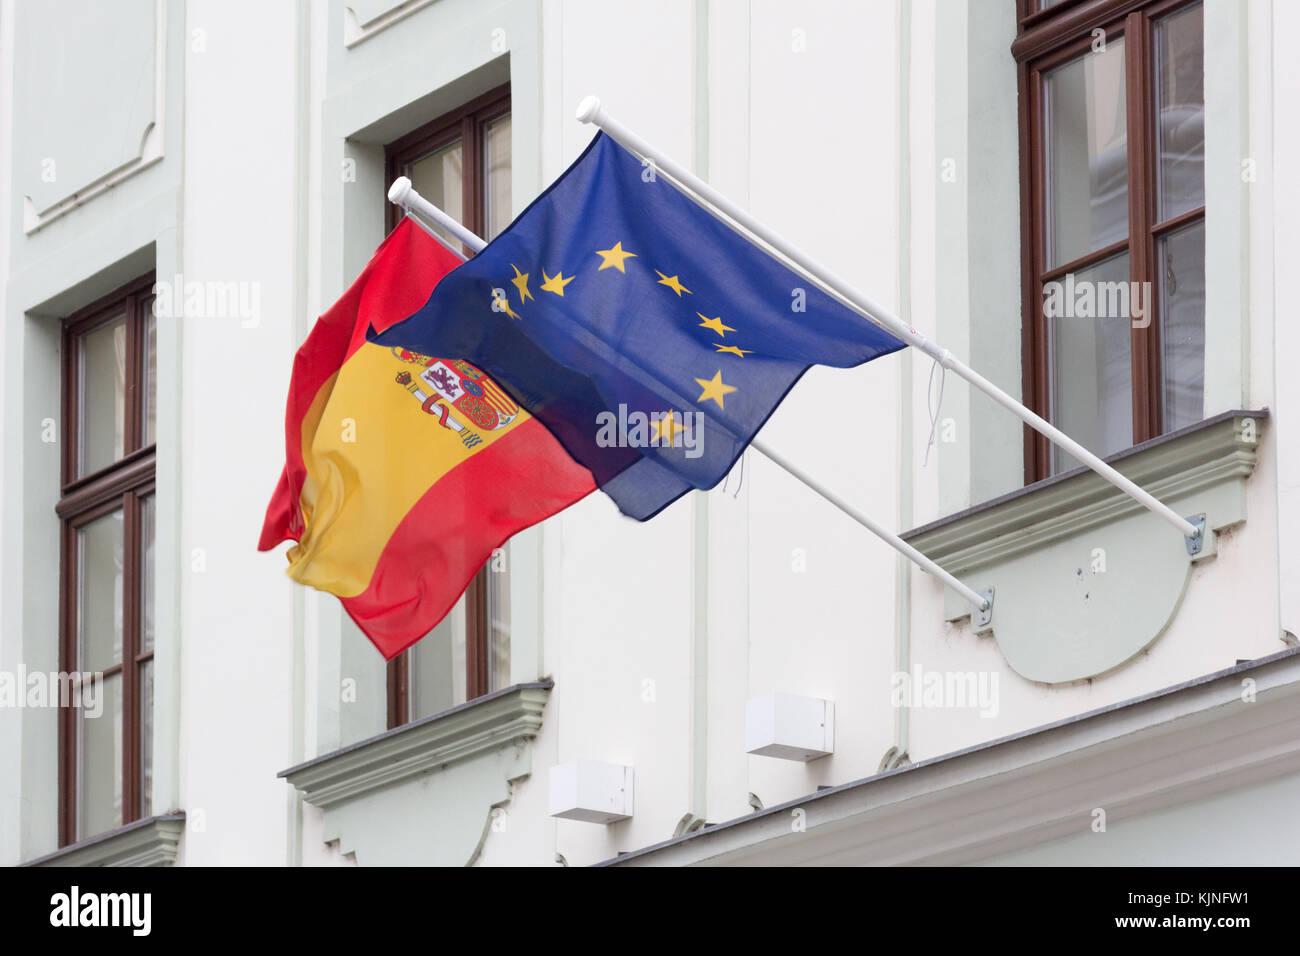 Erfreut Draht Rosa Flagge Bilder - Elektrische Schaltplan-Ideen ...